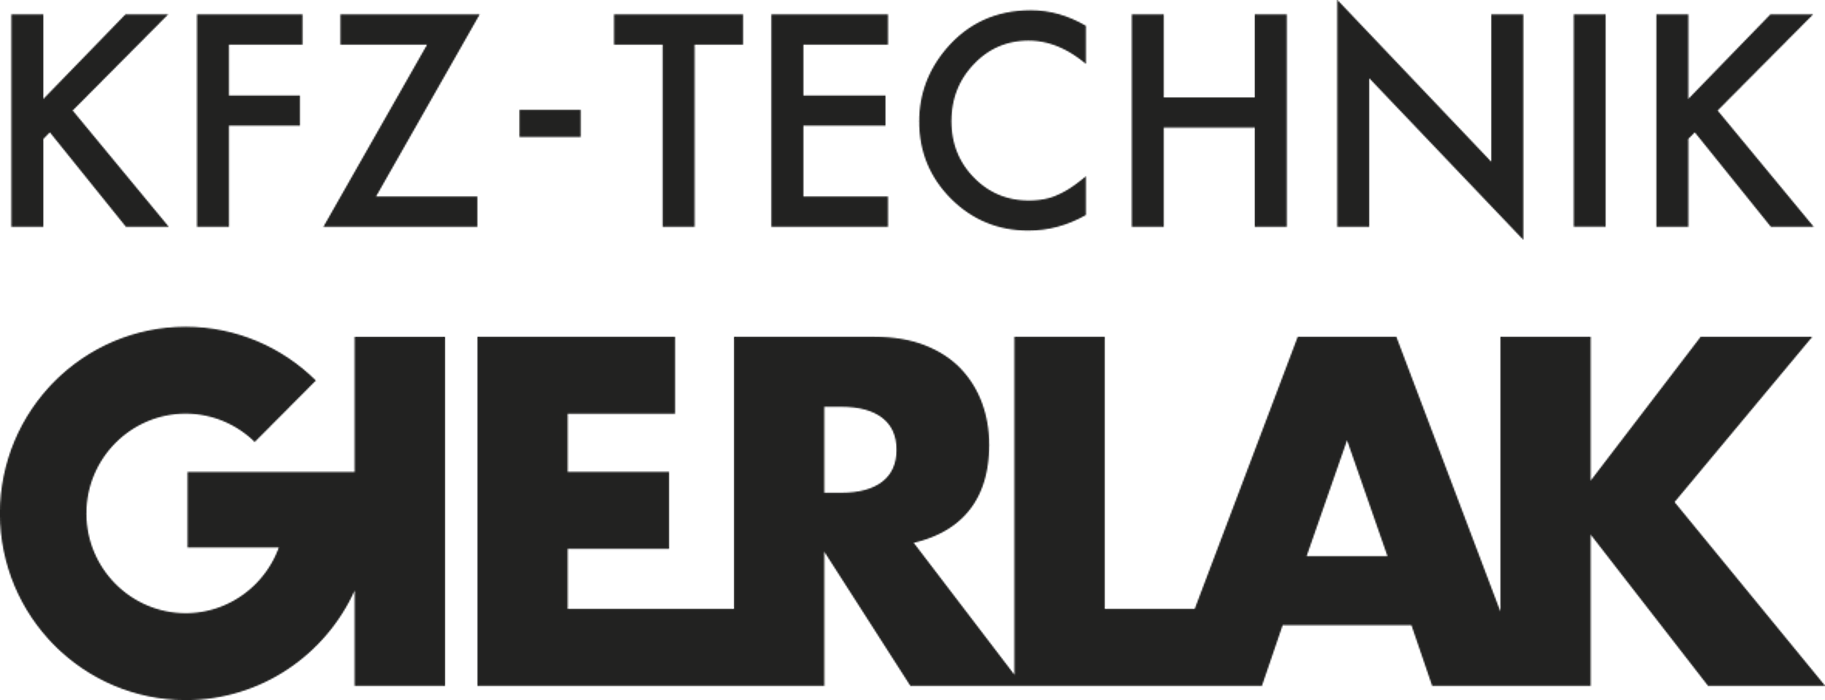 Bild zu KFZ-Technik GIERLAK in Wermelskirchen